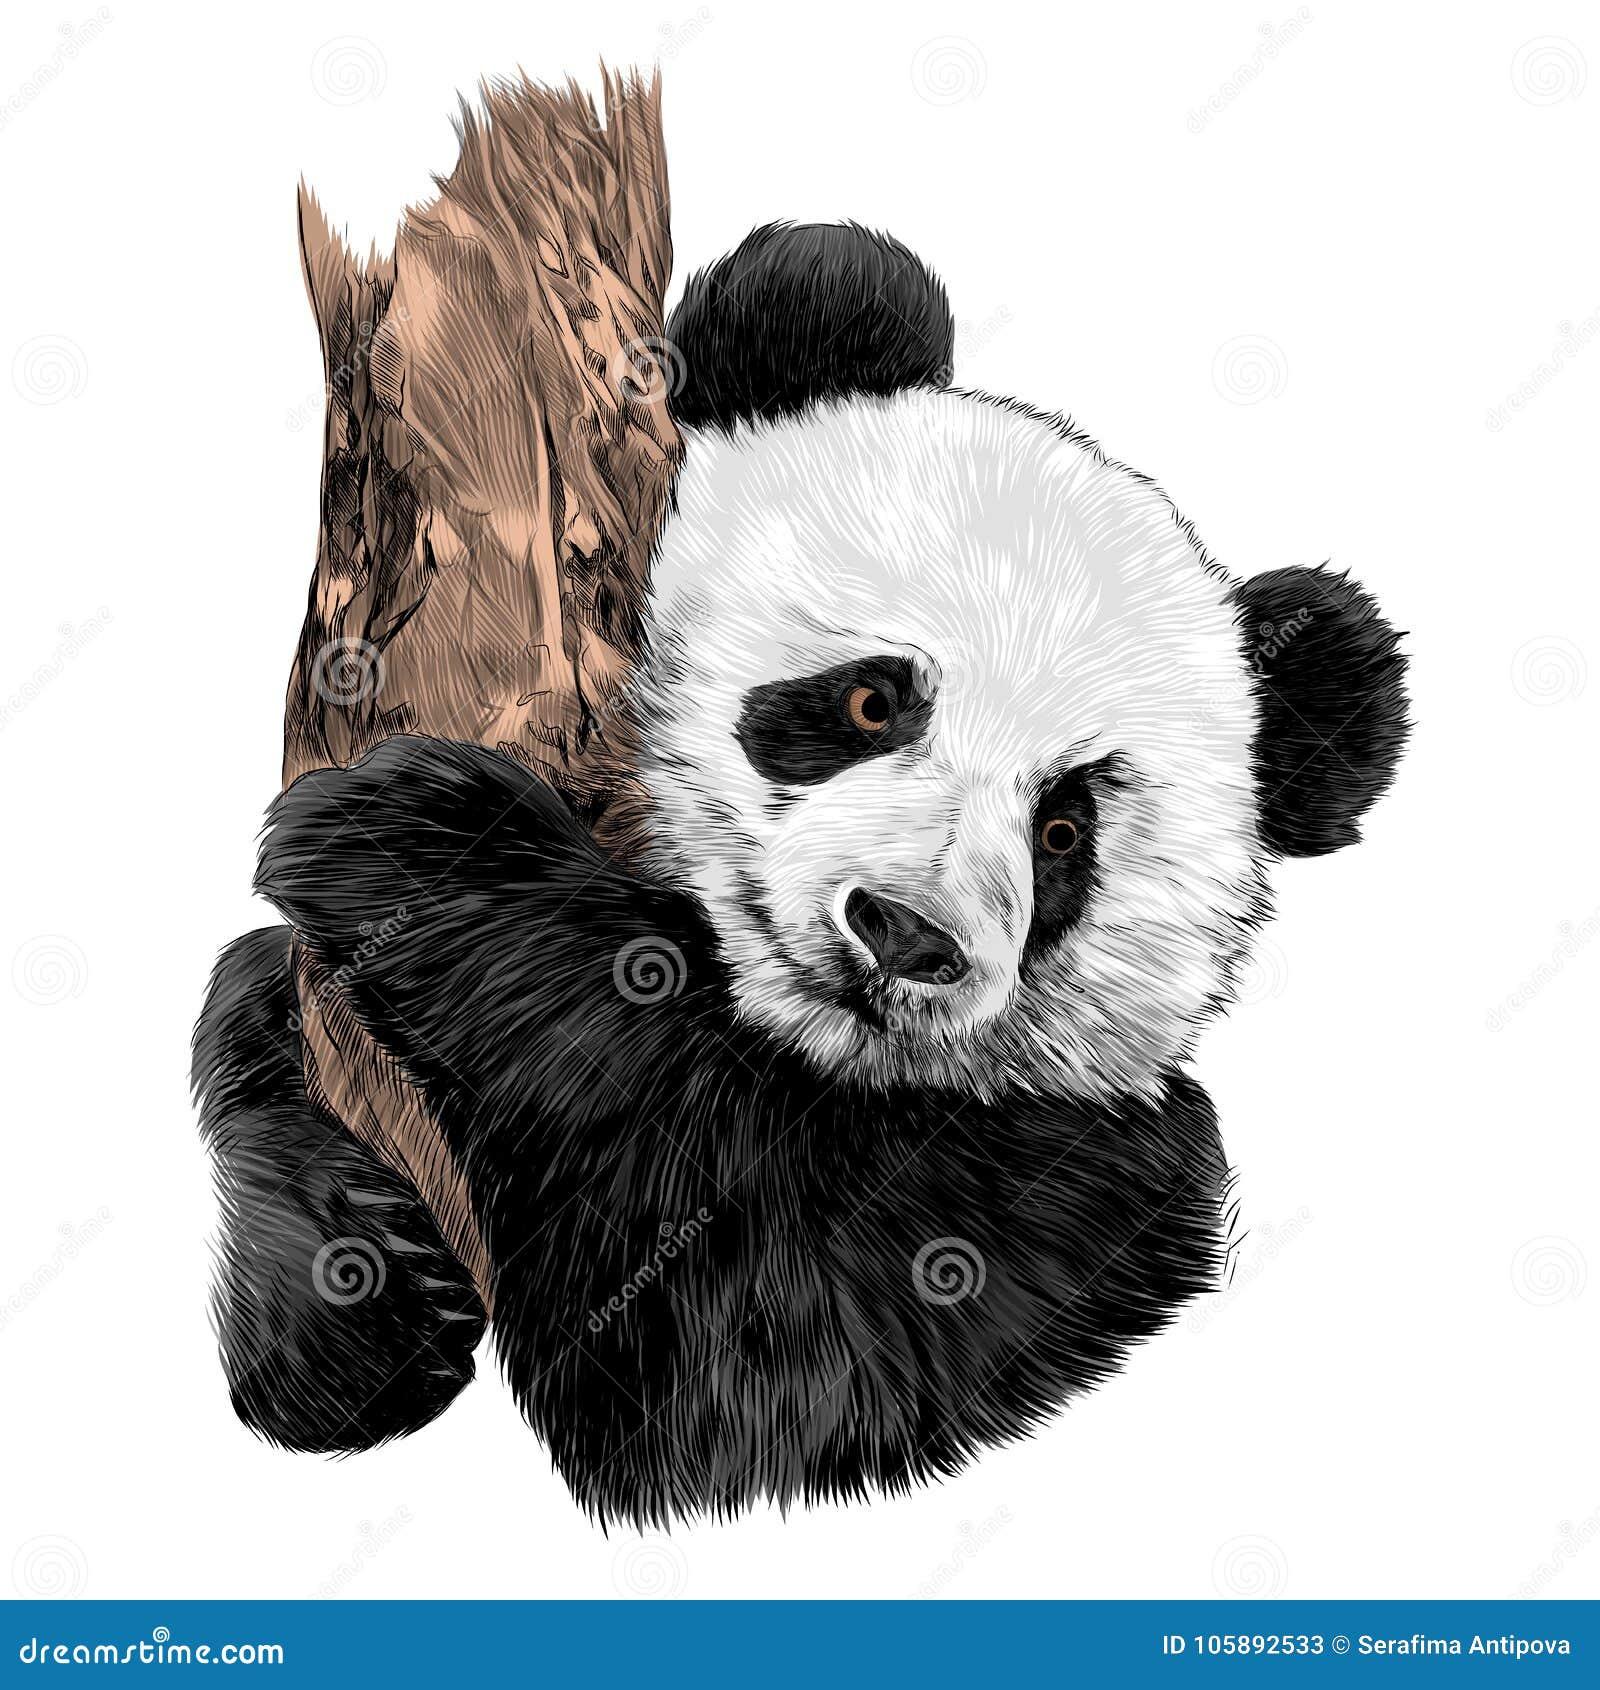 f51e58241c6 Panda Sketch Vector Graphics Stock Vector - Illustration of poster ...